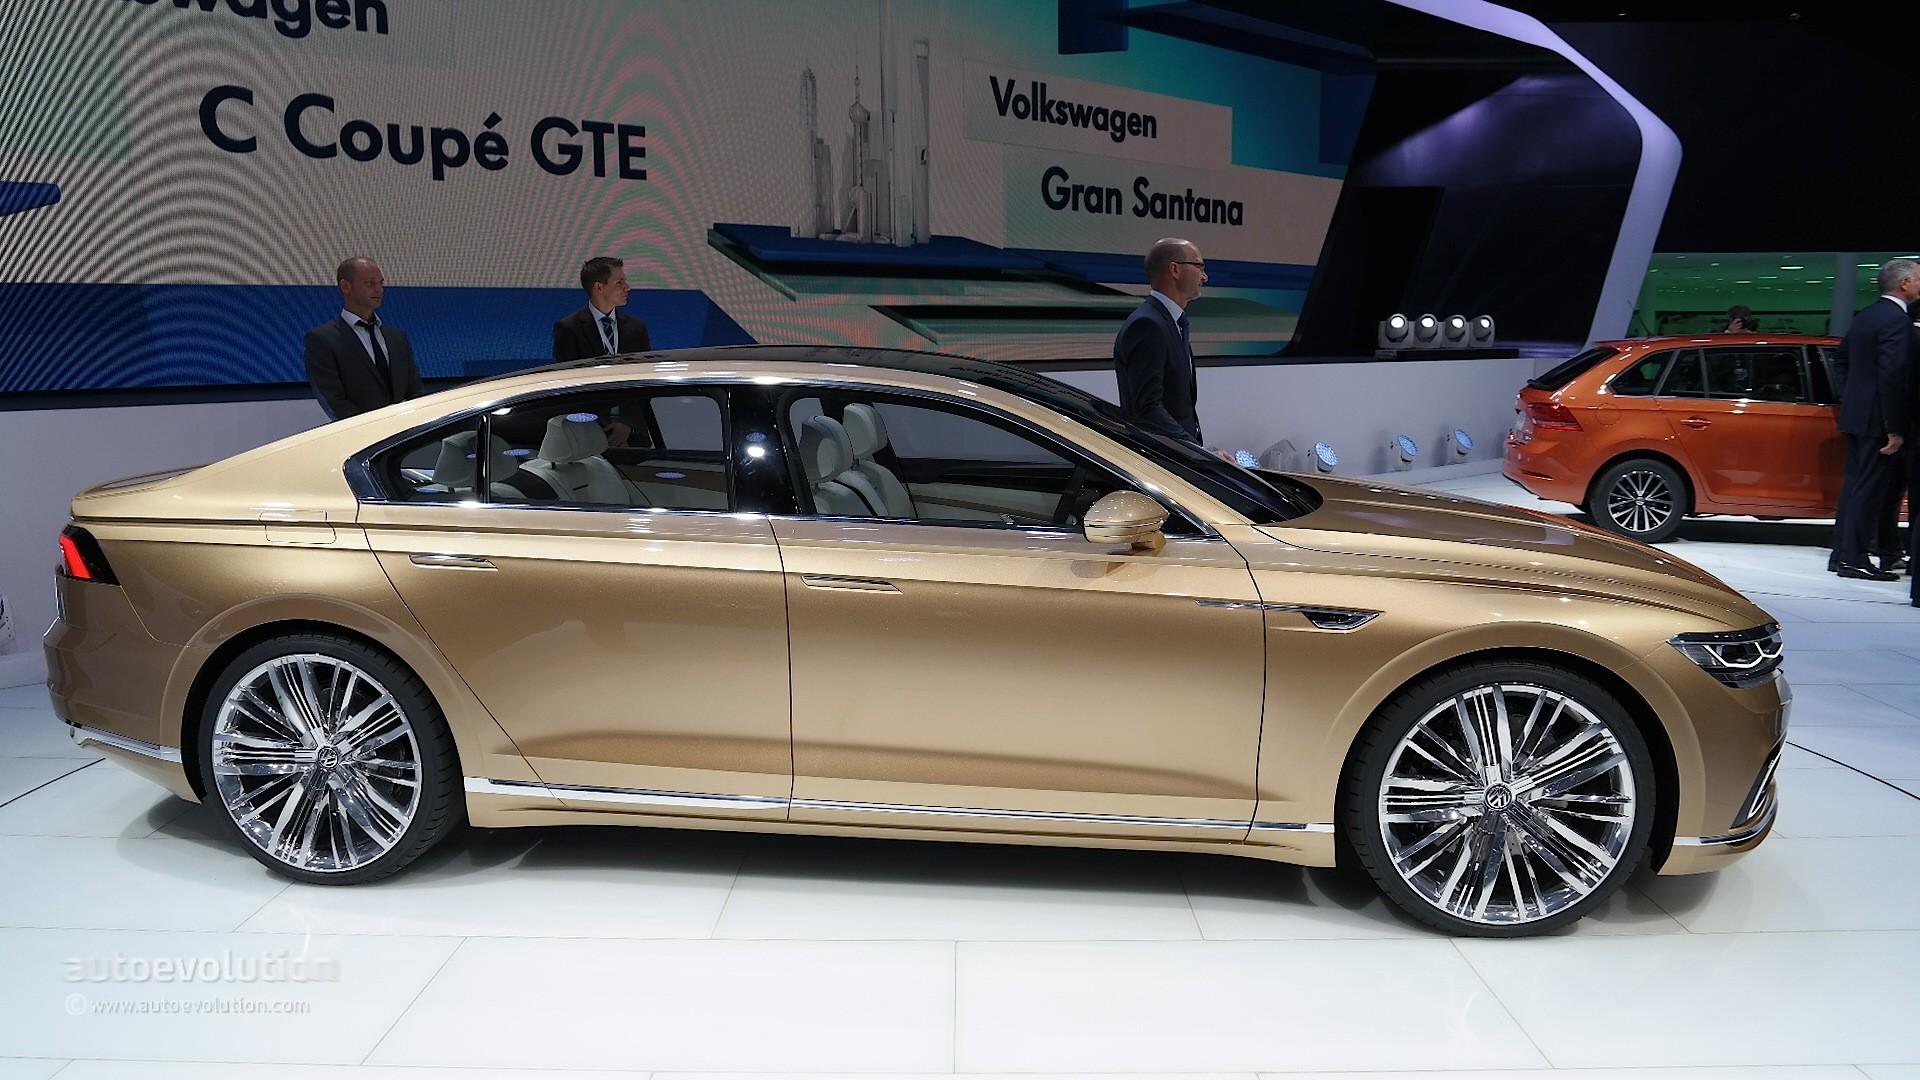 Volkswagen C Coupe GTE Previews New Sub-Phaeton Sedan at Shanghai 2015 ...